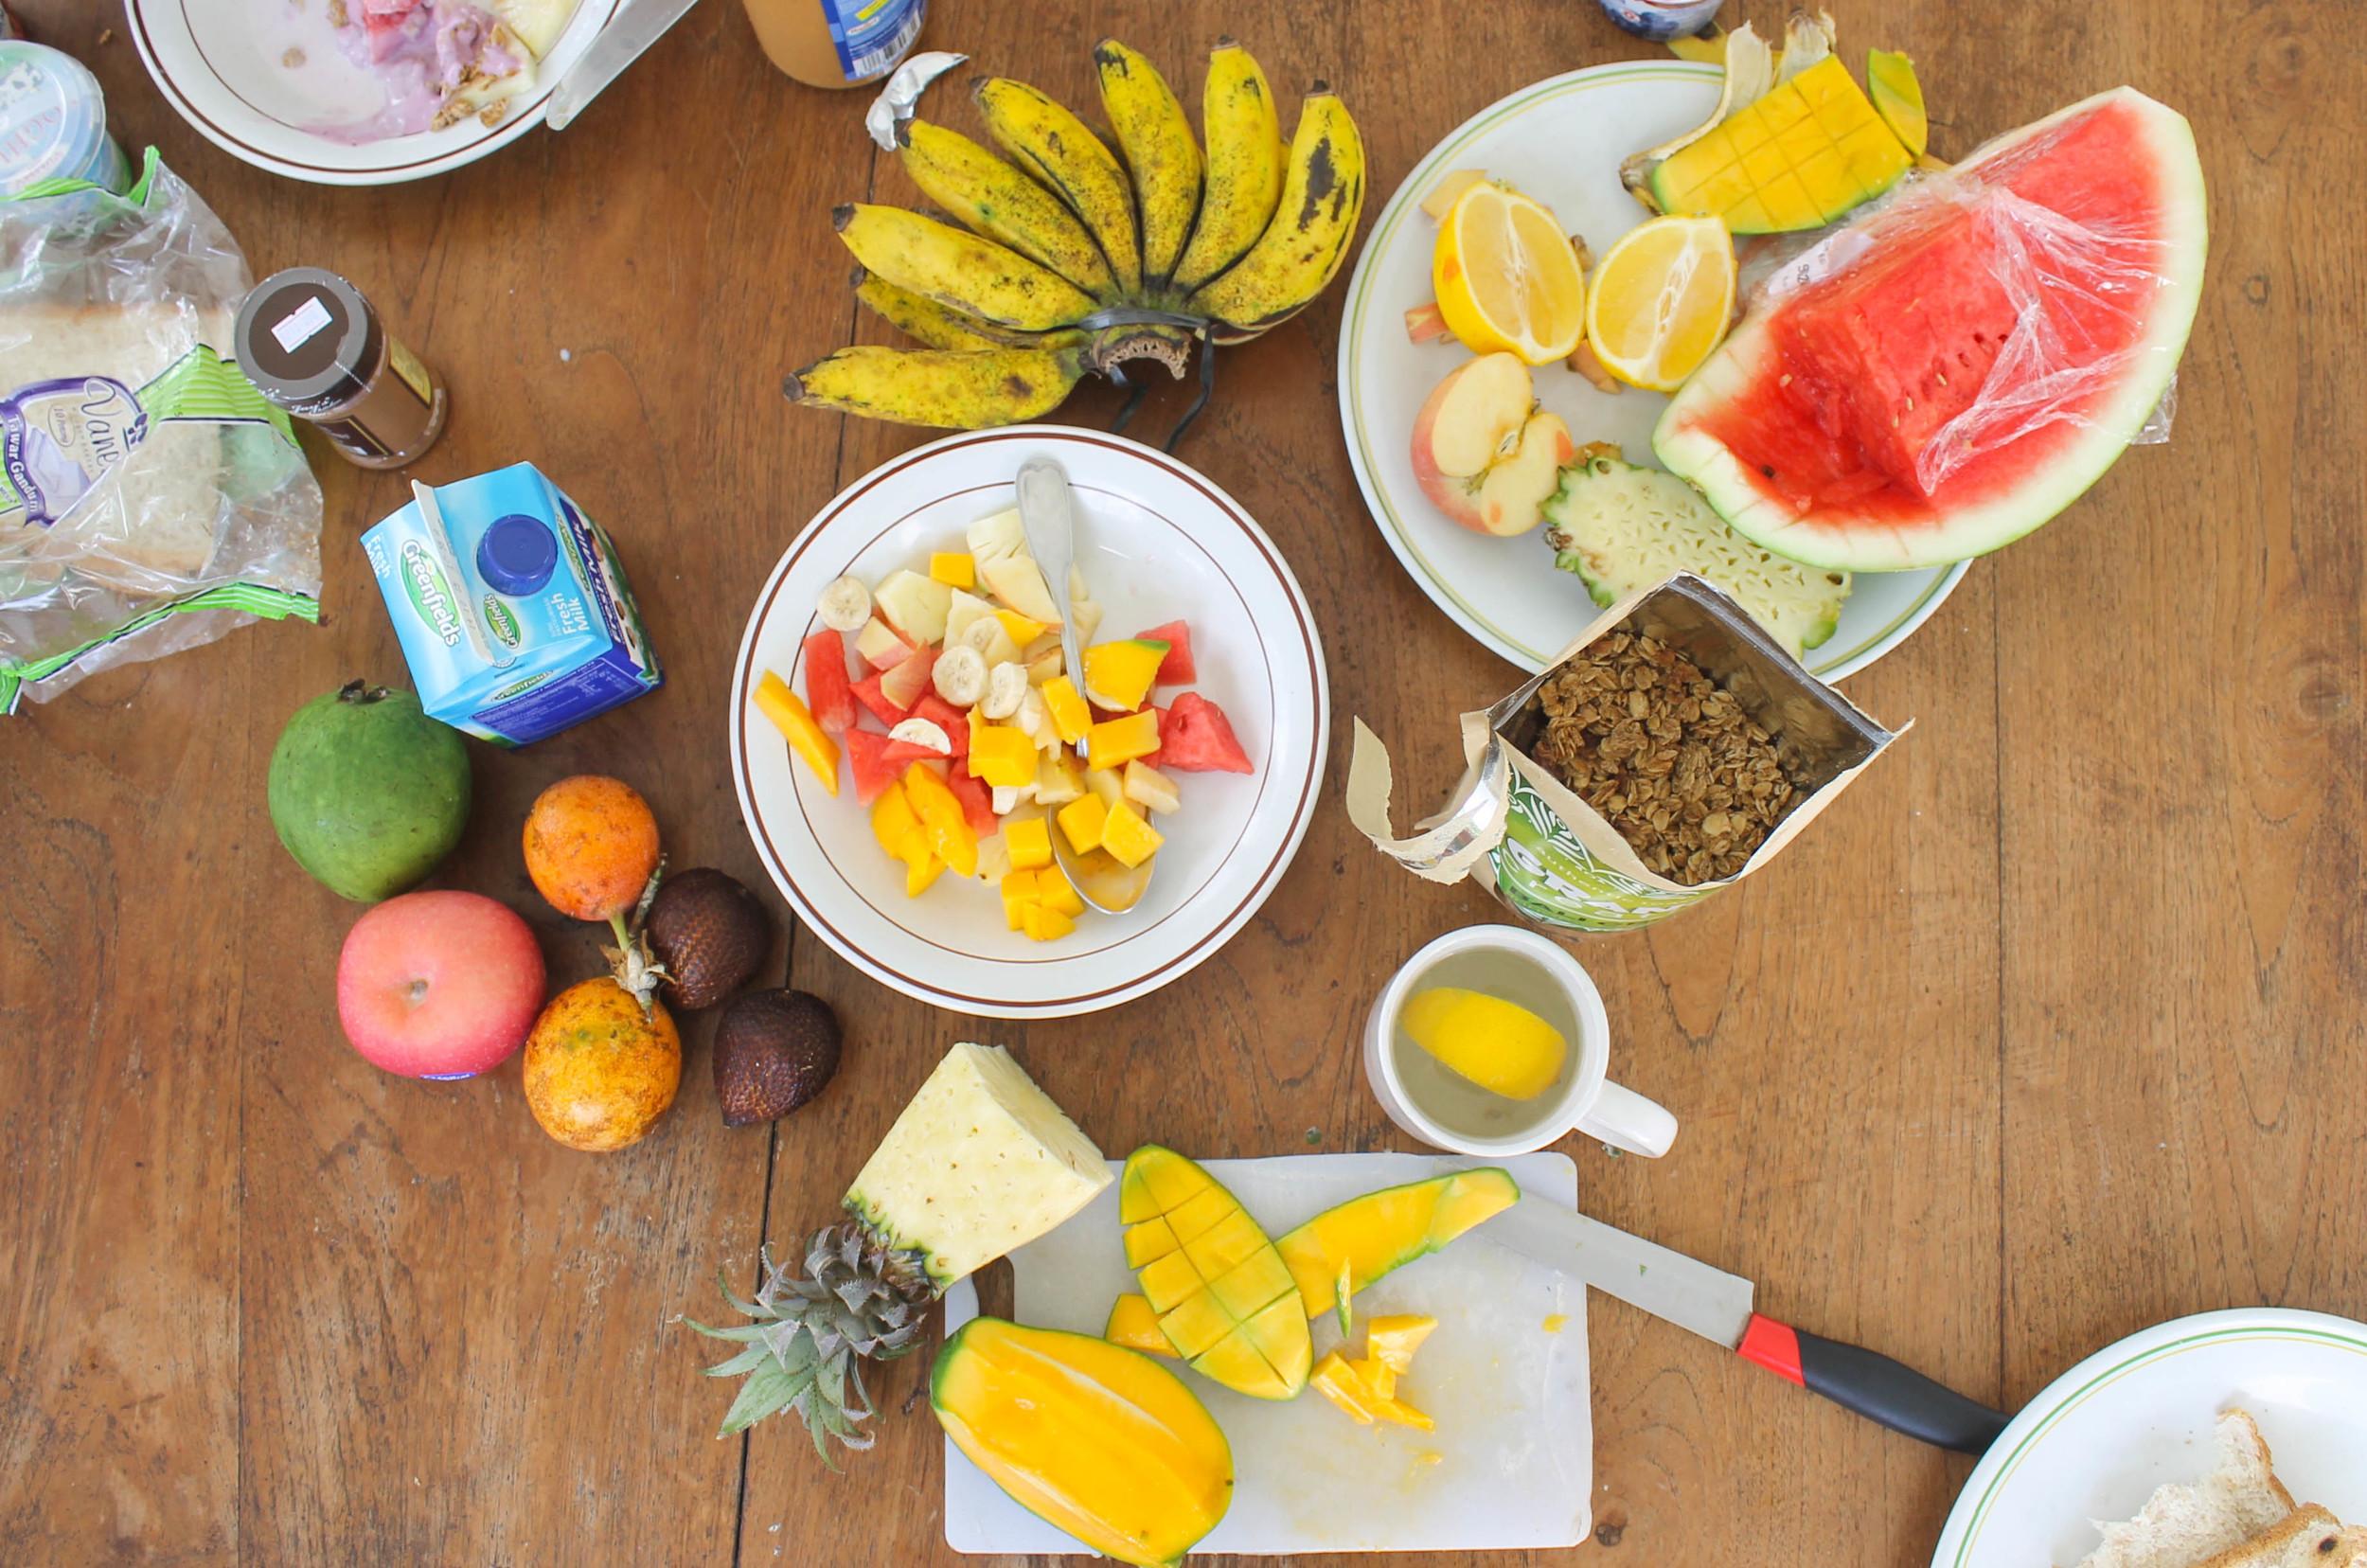 Canggu's fruit shops began a morning tradition of giant bowls of fresh fruit, muesli and yogurt.